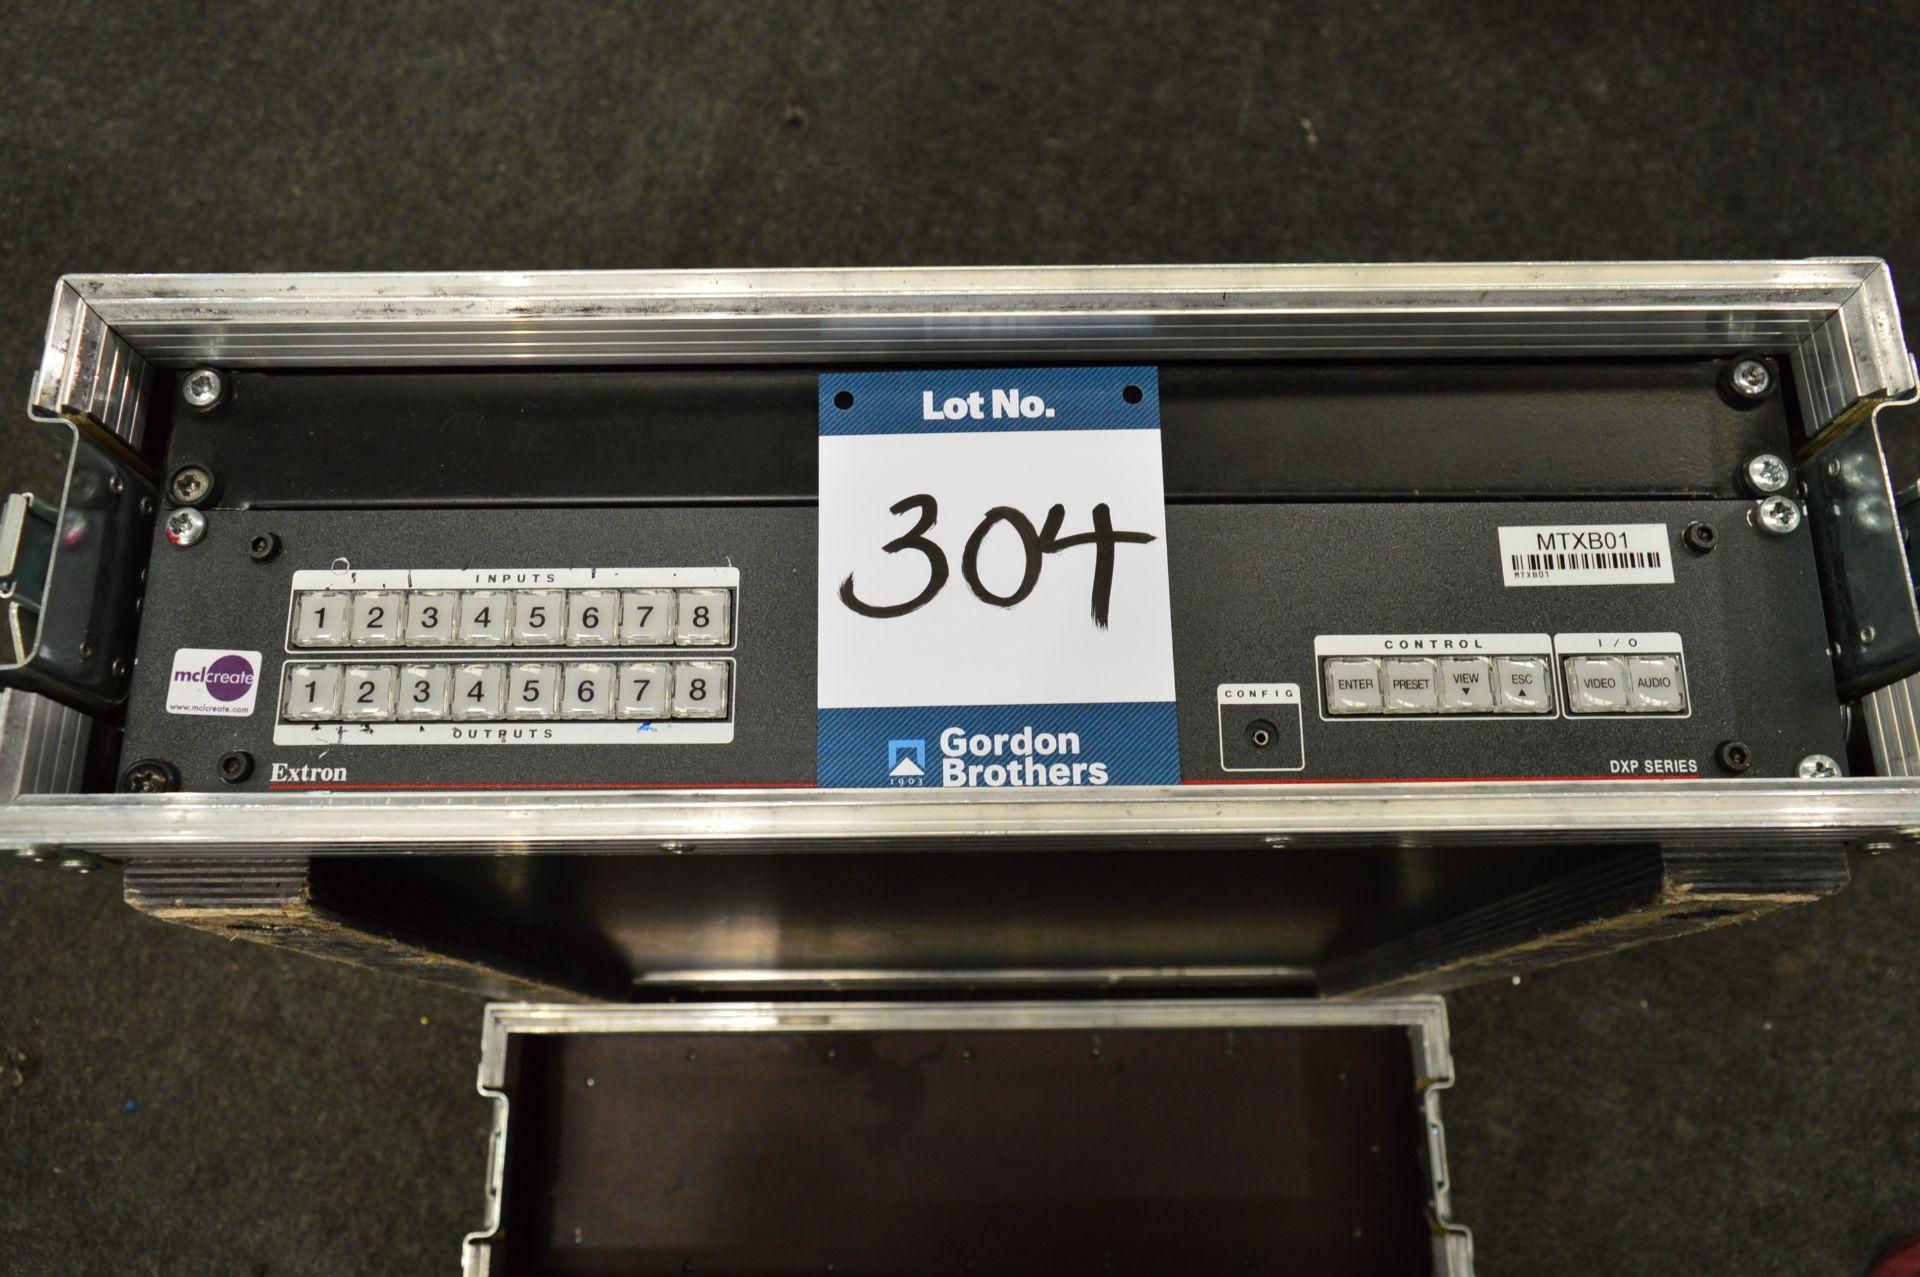 Lot 304 - Extron, DXP Series 8/8 digital cross point matrix